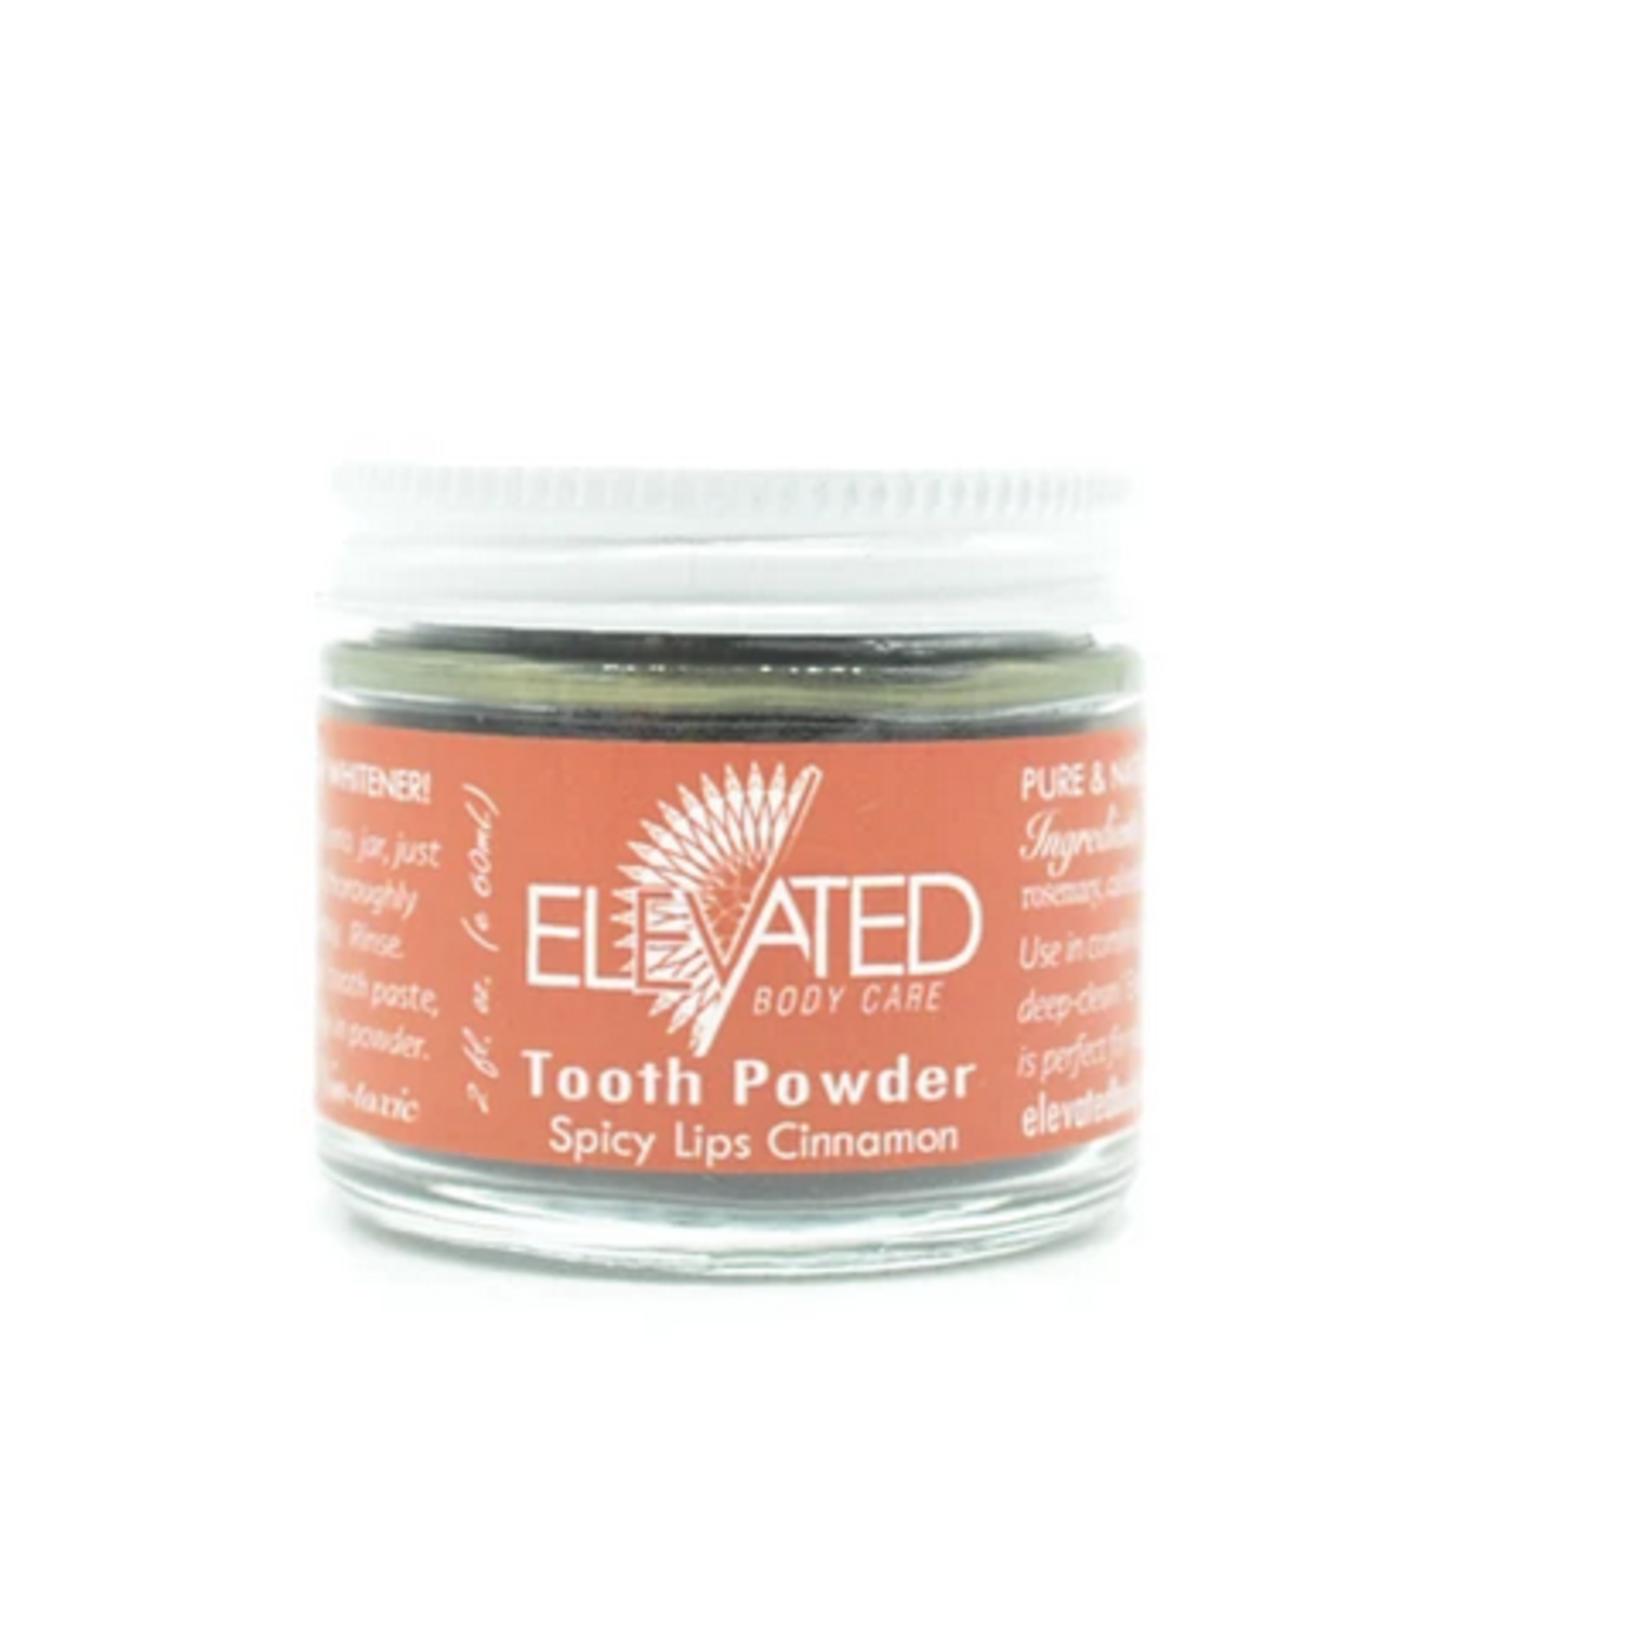 Taylor's Cinnamon Tooth Powder